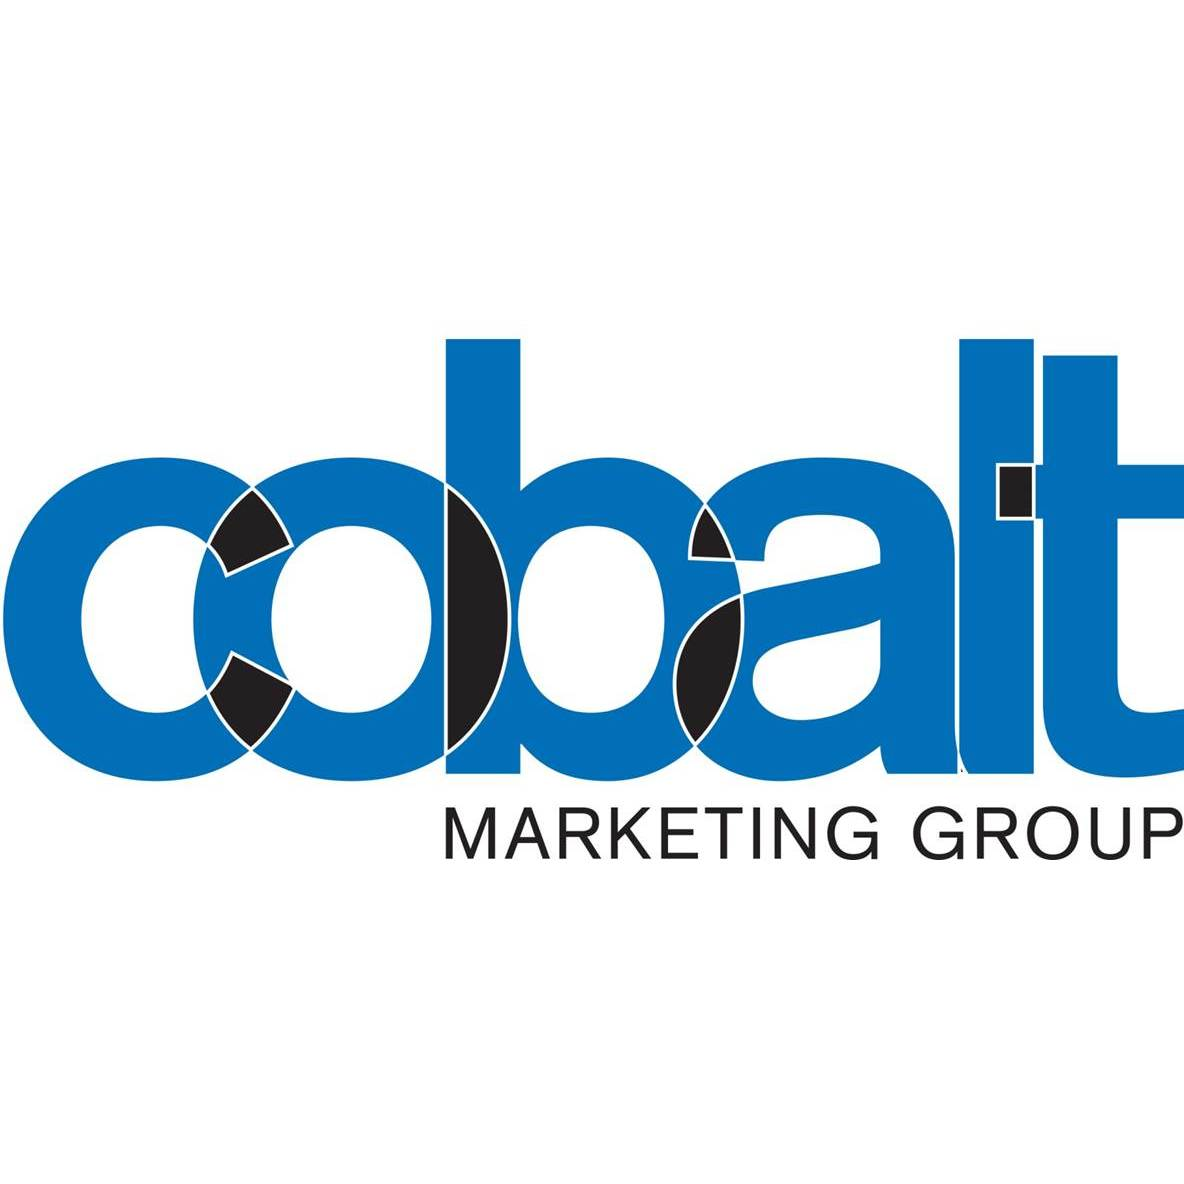 Cobalt Marketing Group - ad image